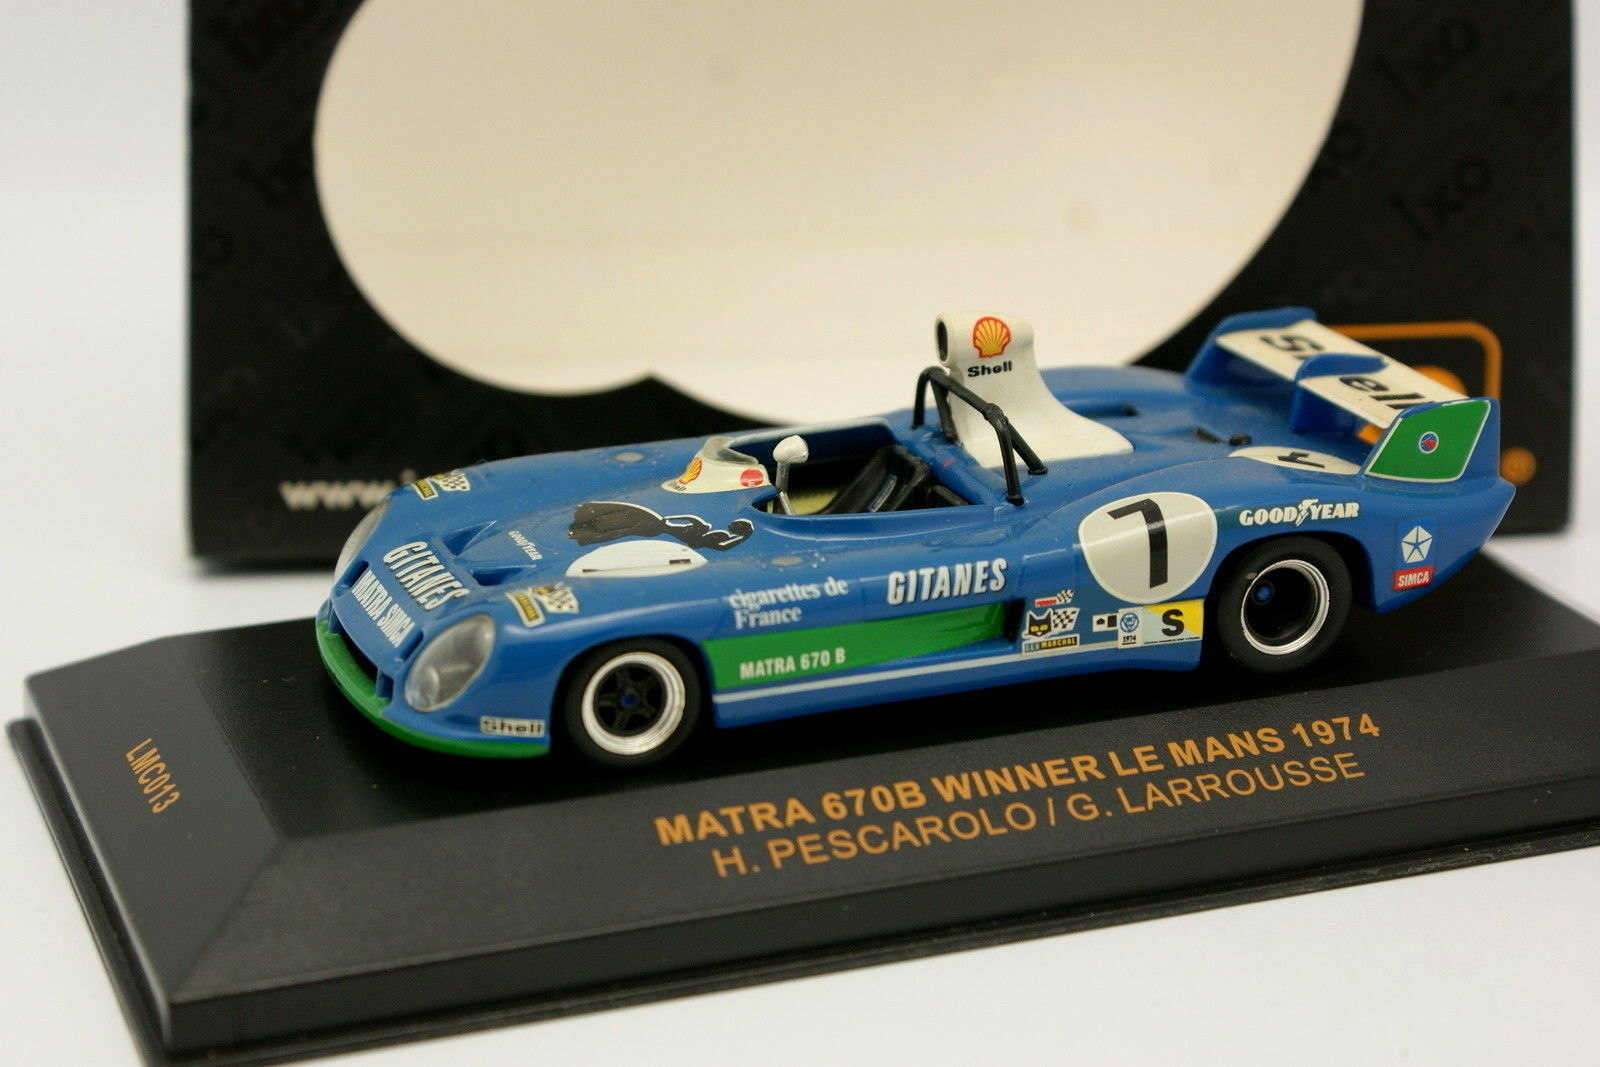 Ixo 1 43 - Matra Simca 670B Gitanes Winner Le Mans 1974